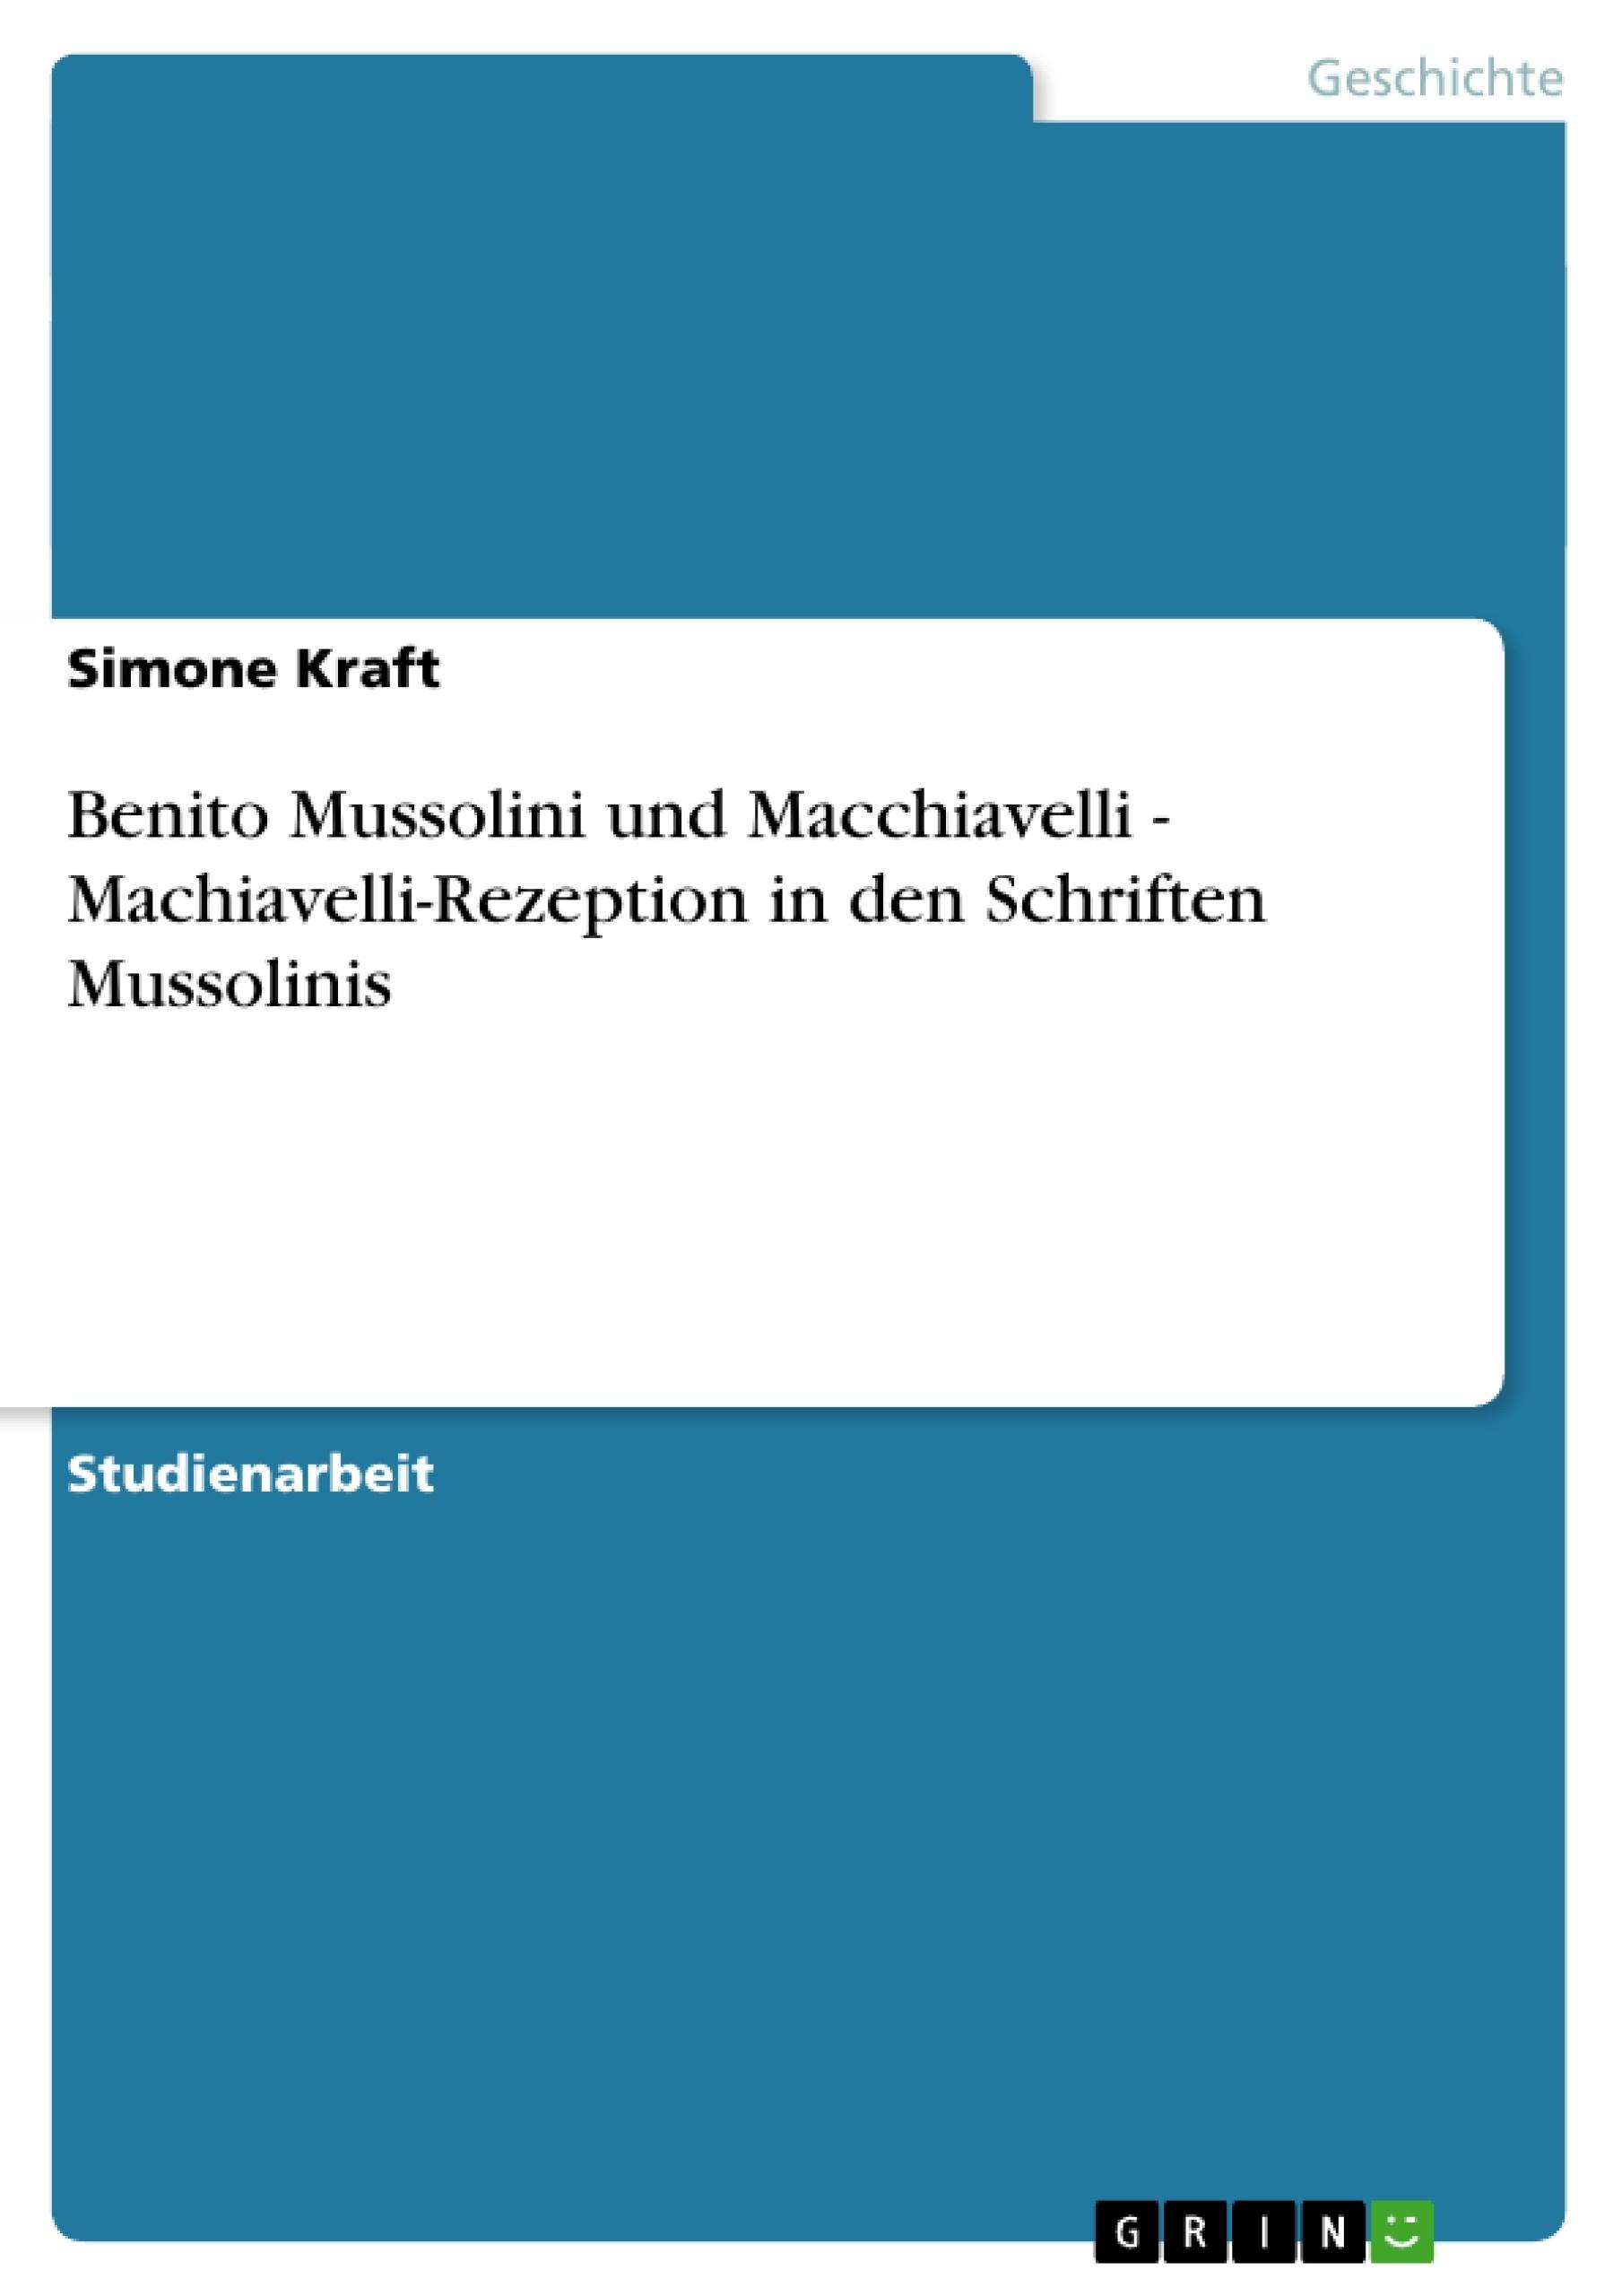 Titel: Benito Mussolini und Macchiavelli  -  Machiavelli-Rezeption in den Schriften Mussolinis